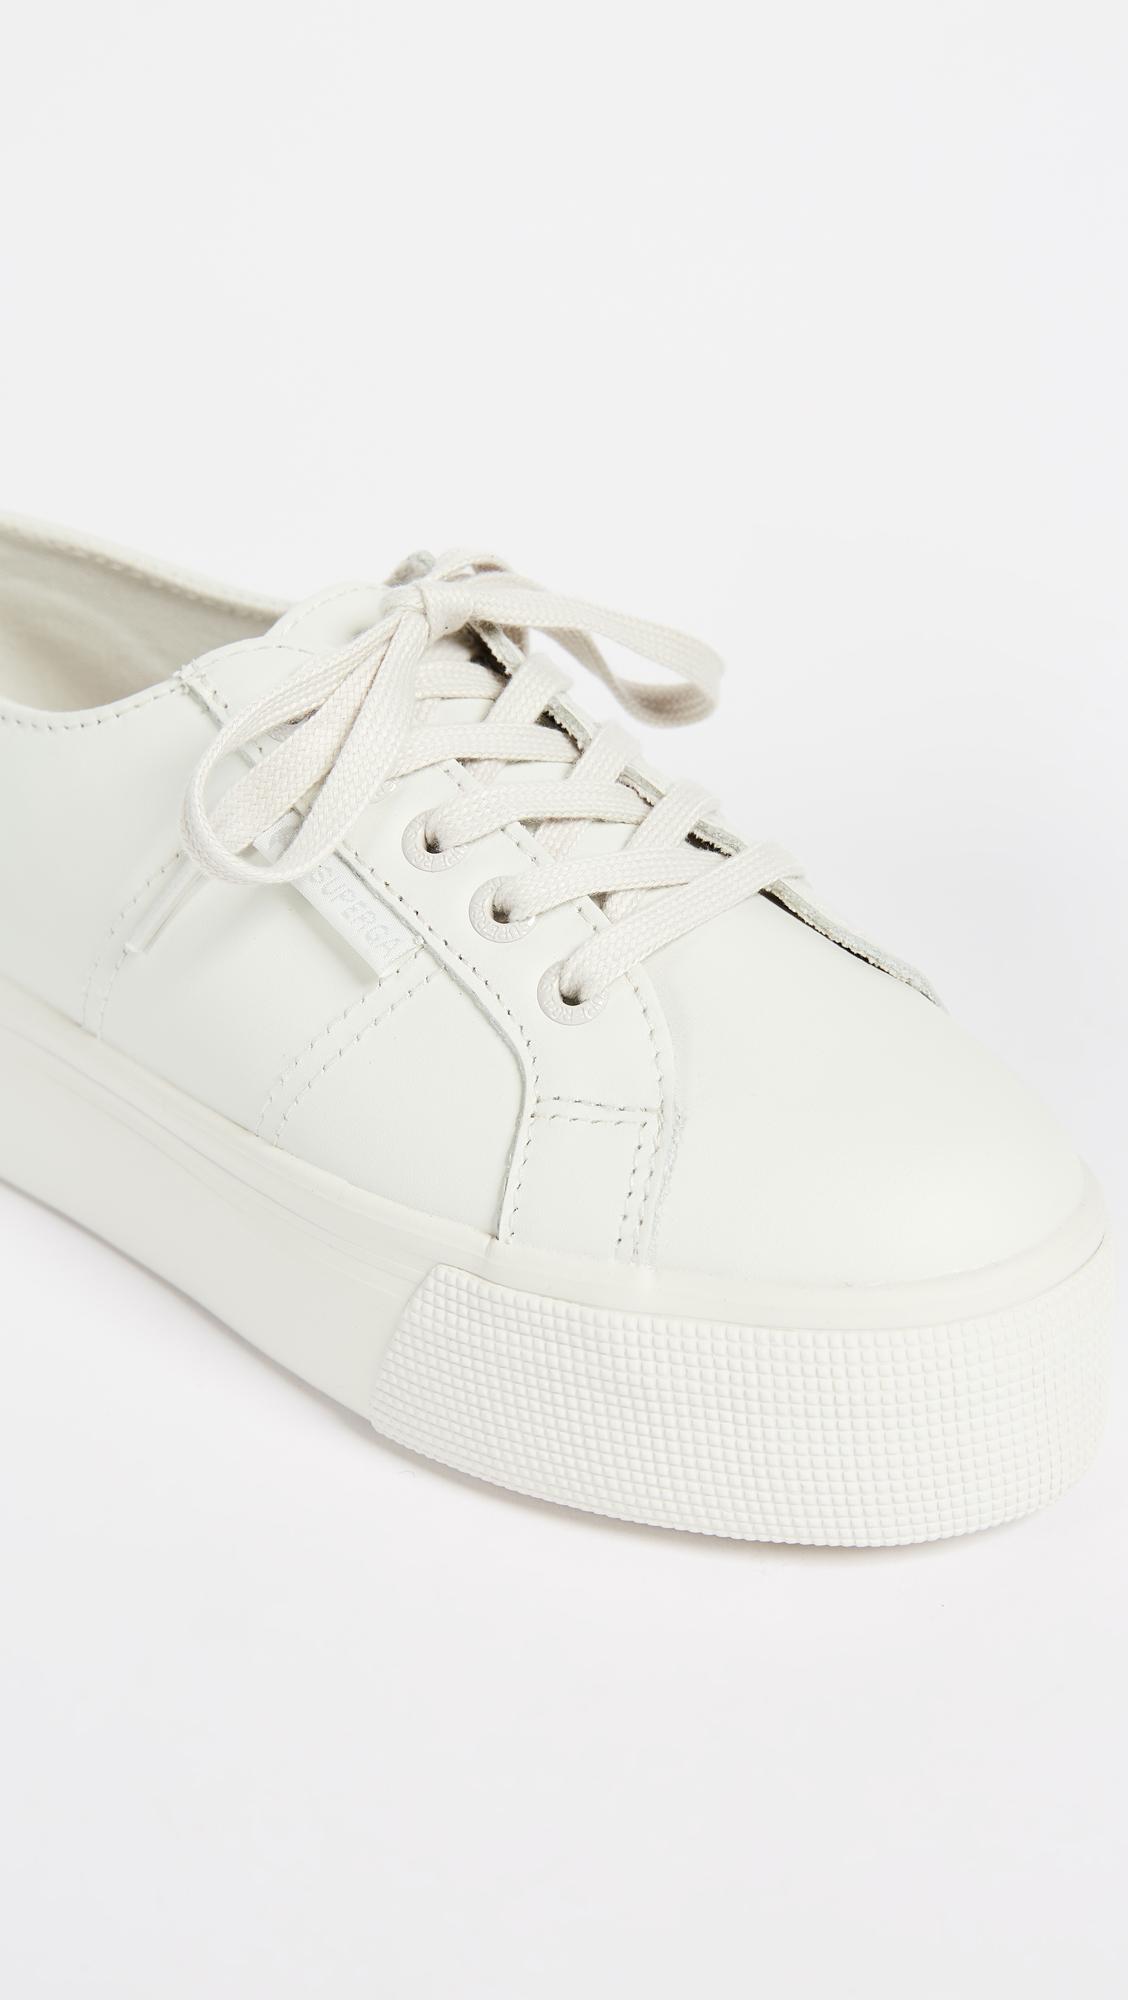 07f108d098f9 Superga 2790 FGLW Platform Sneakers